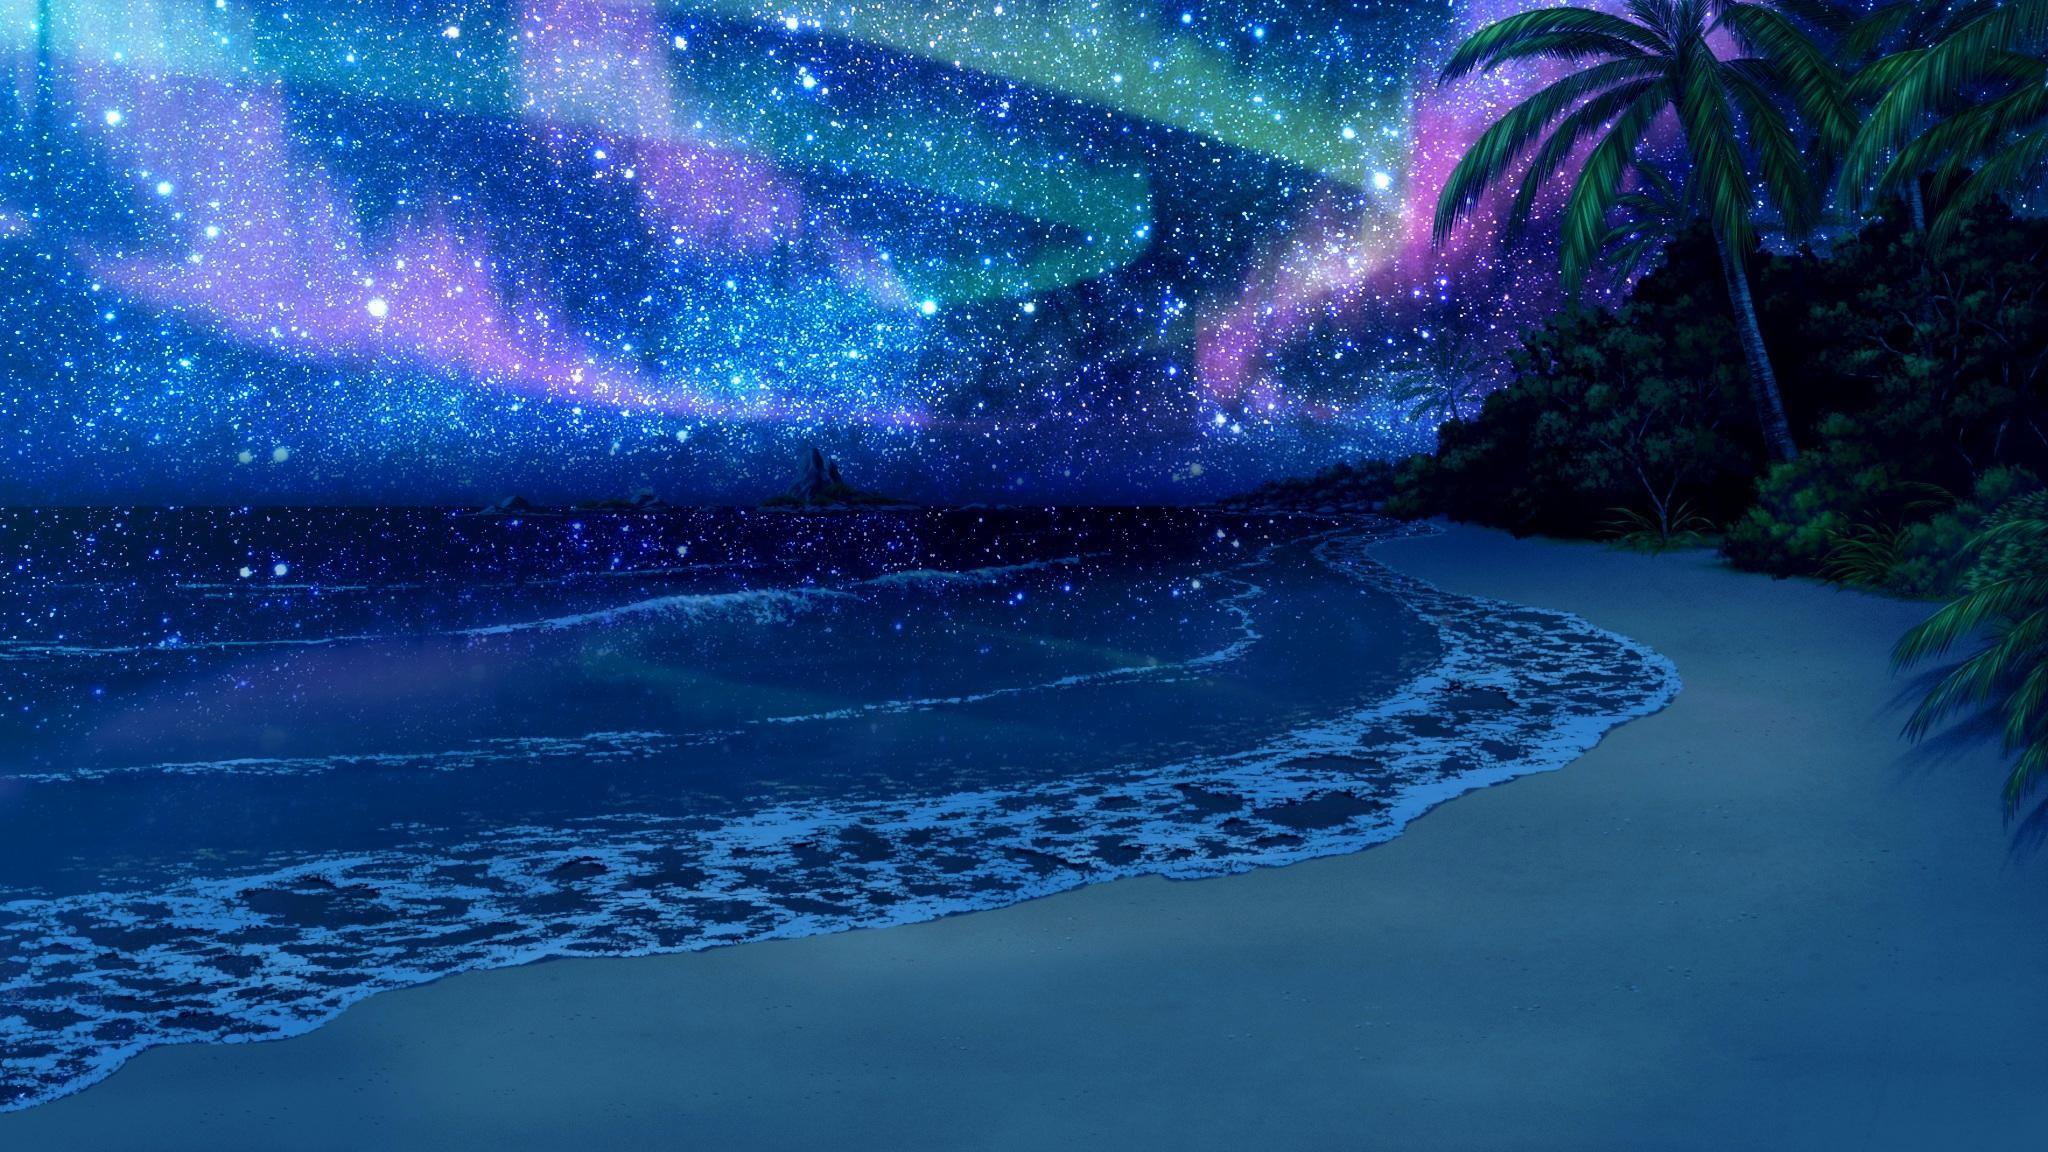 wallpaper.wiki-Beach-At-Night-Background-Download-Free-